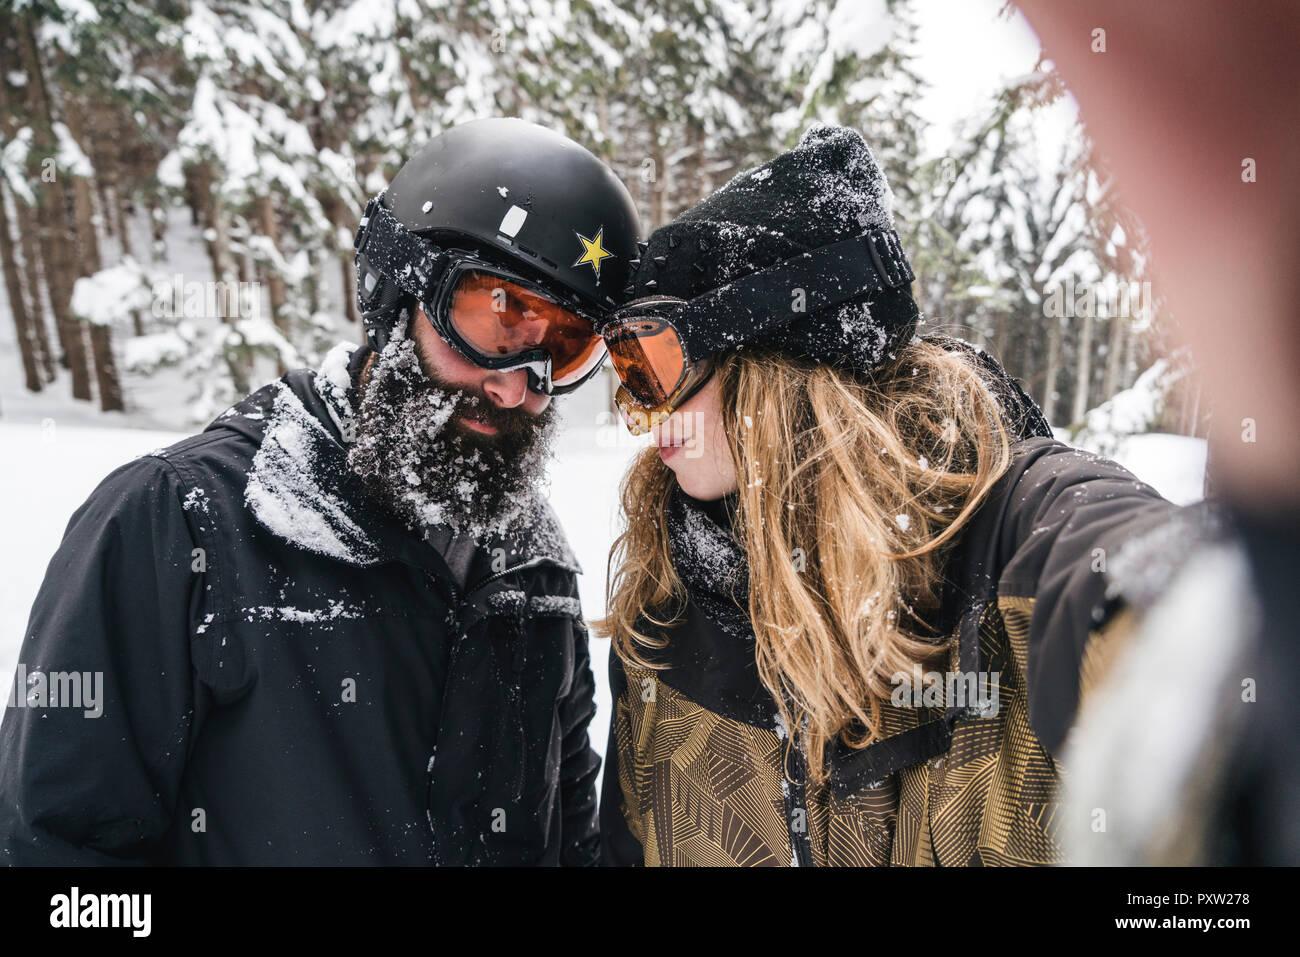 Selfie of couple in skiwear in winter forest - Stock Image